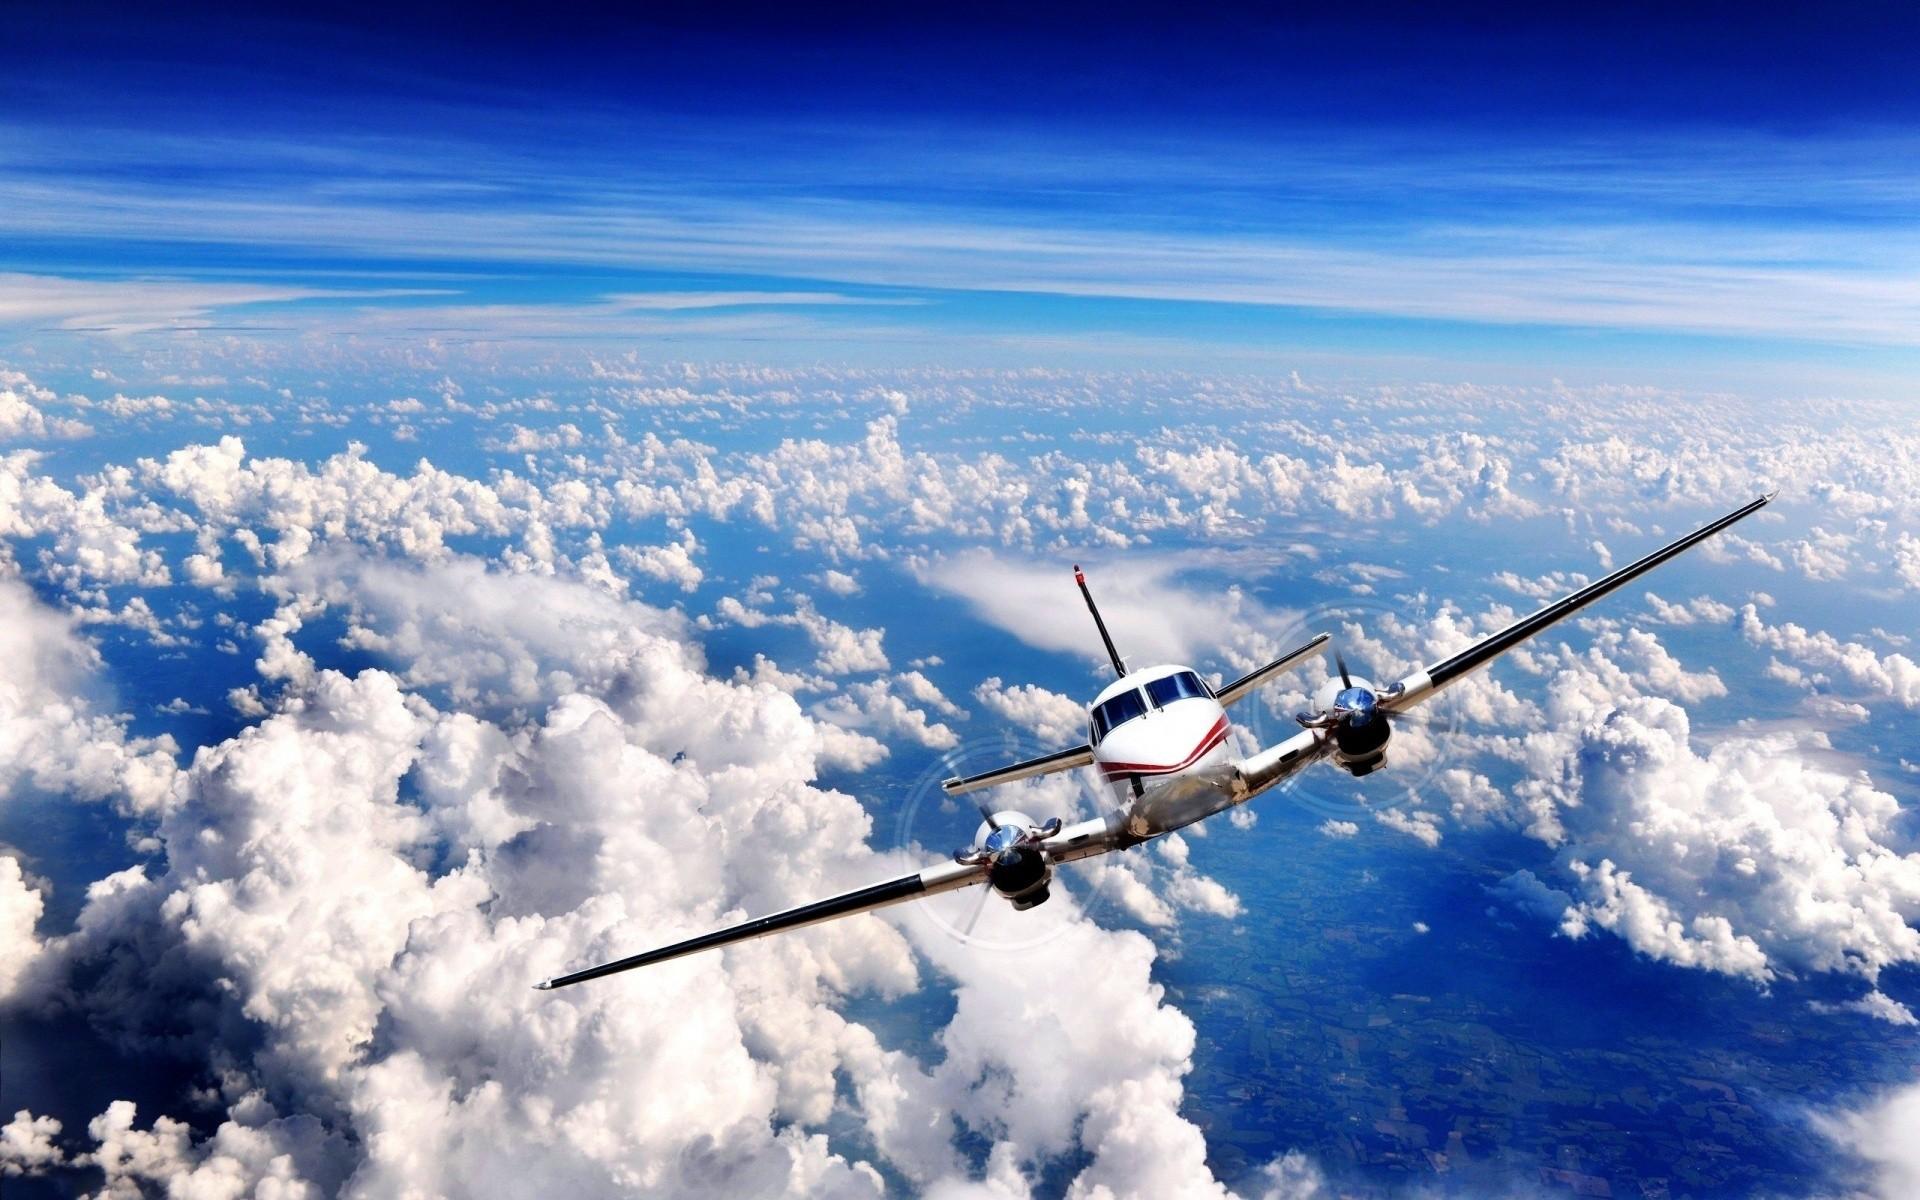 Стала известна причина экстренной посадки самолёта «Пекин— Москва»